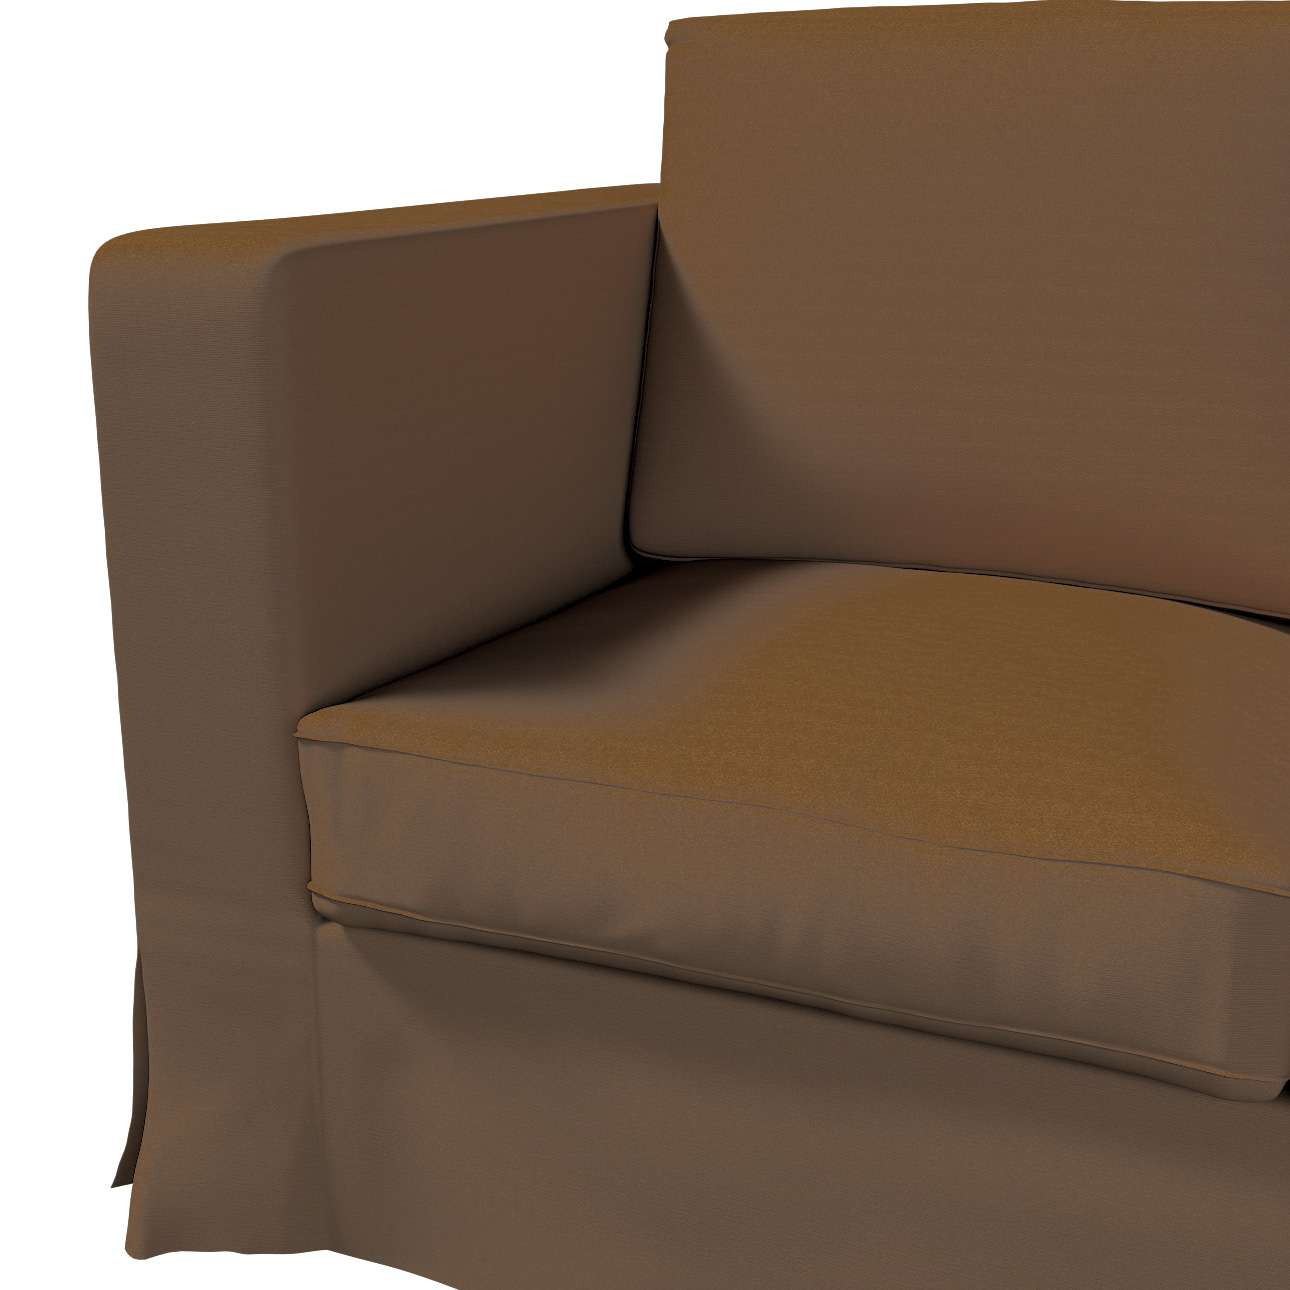 Karlanda klädsel 3-sits soffa - lång i kollektionen Panama Cotton, Tyg: 702-02